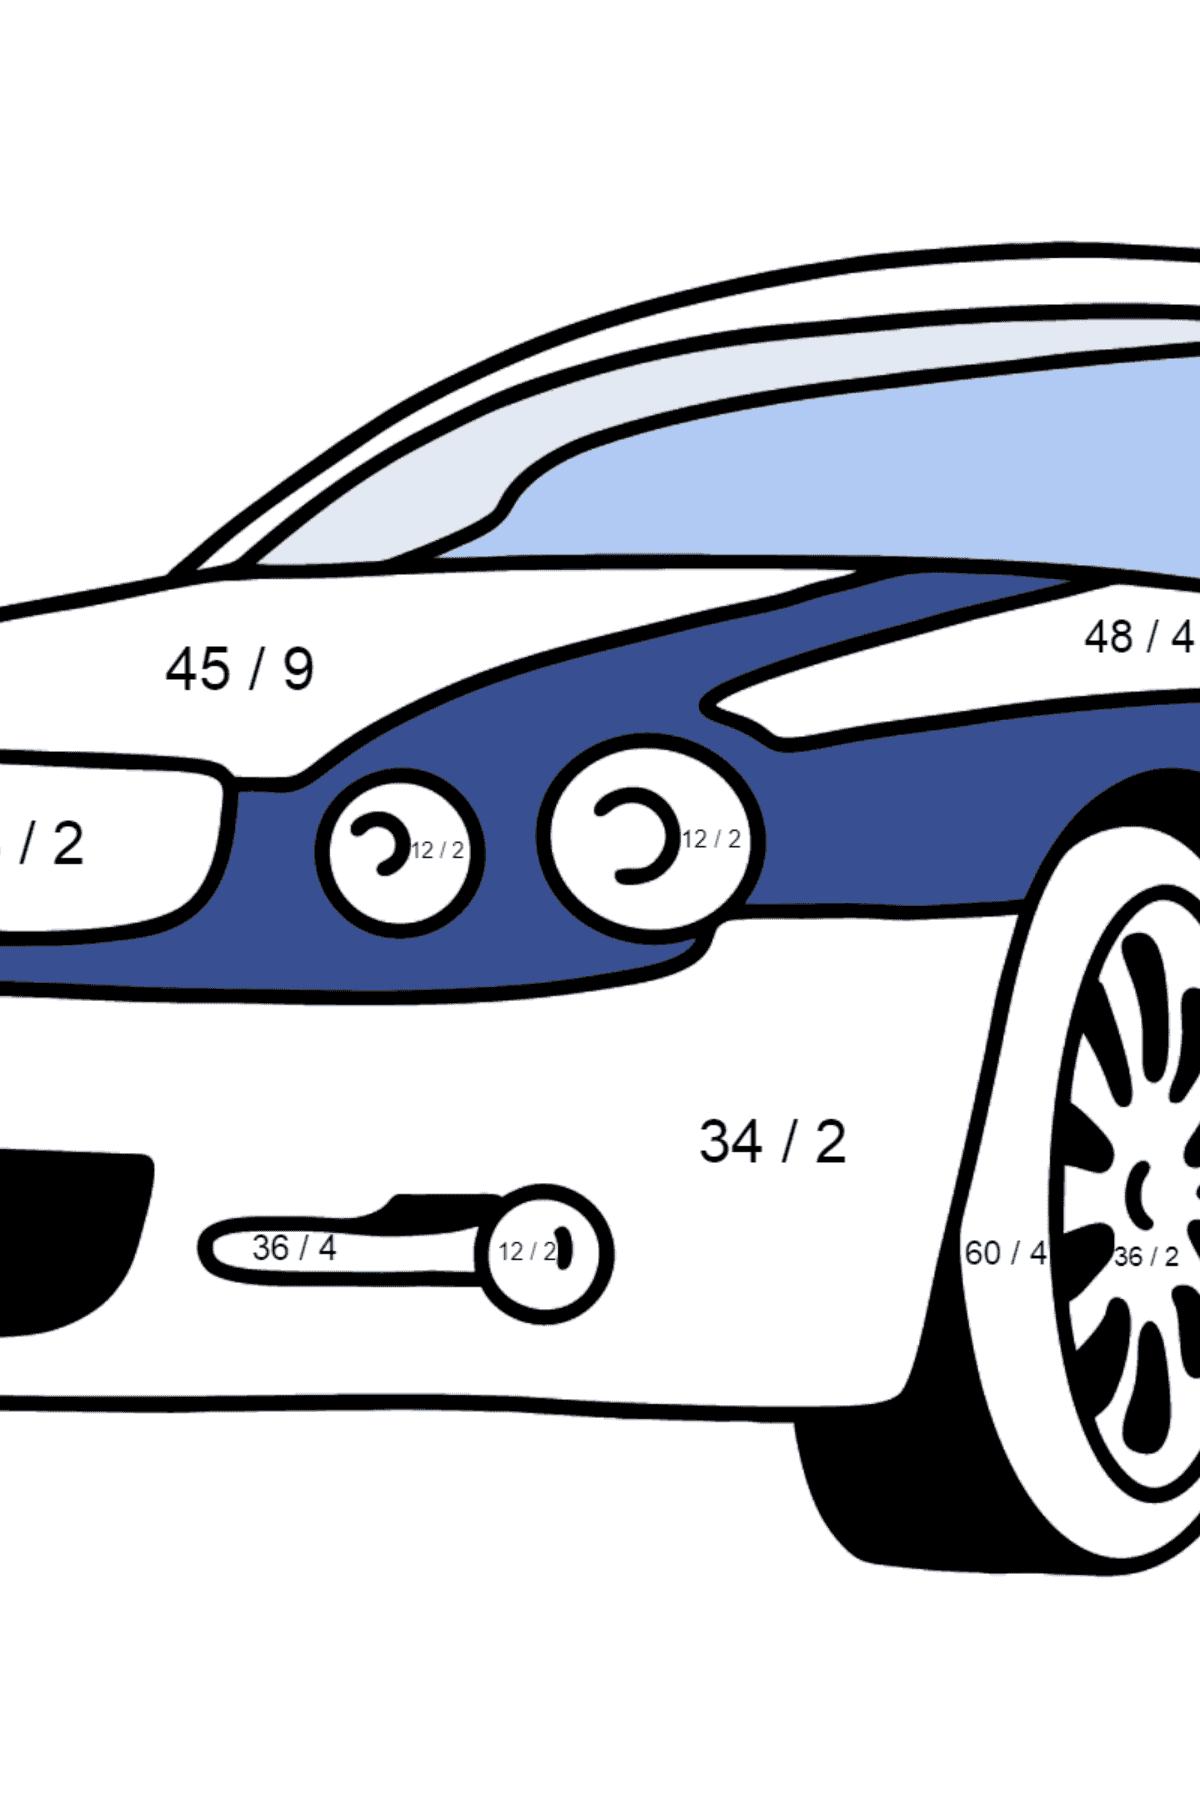 Jaguar GT coloring page - Math Coloring - Division for Kids